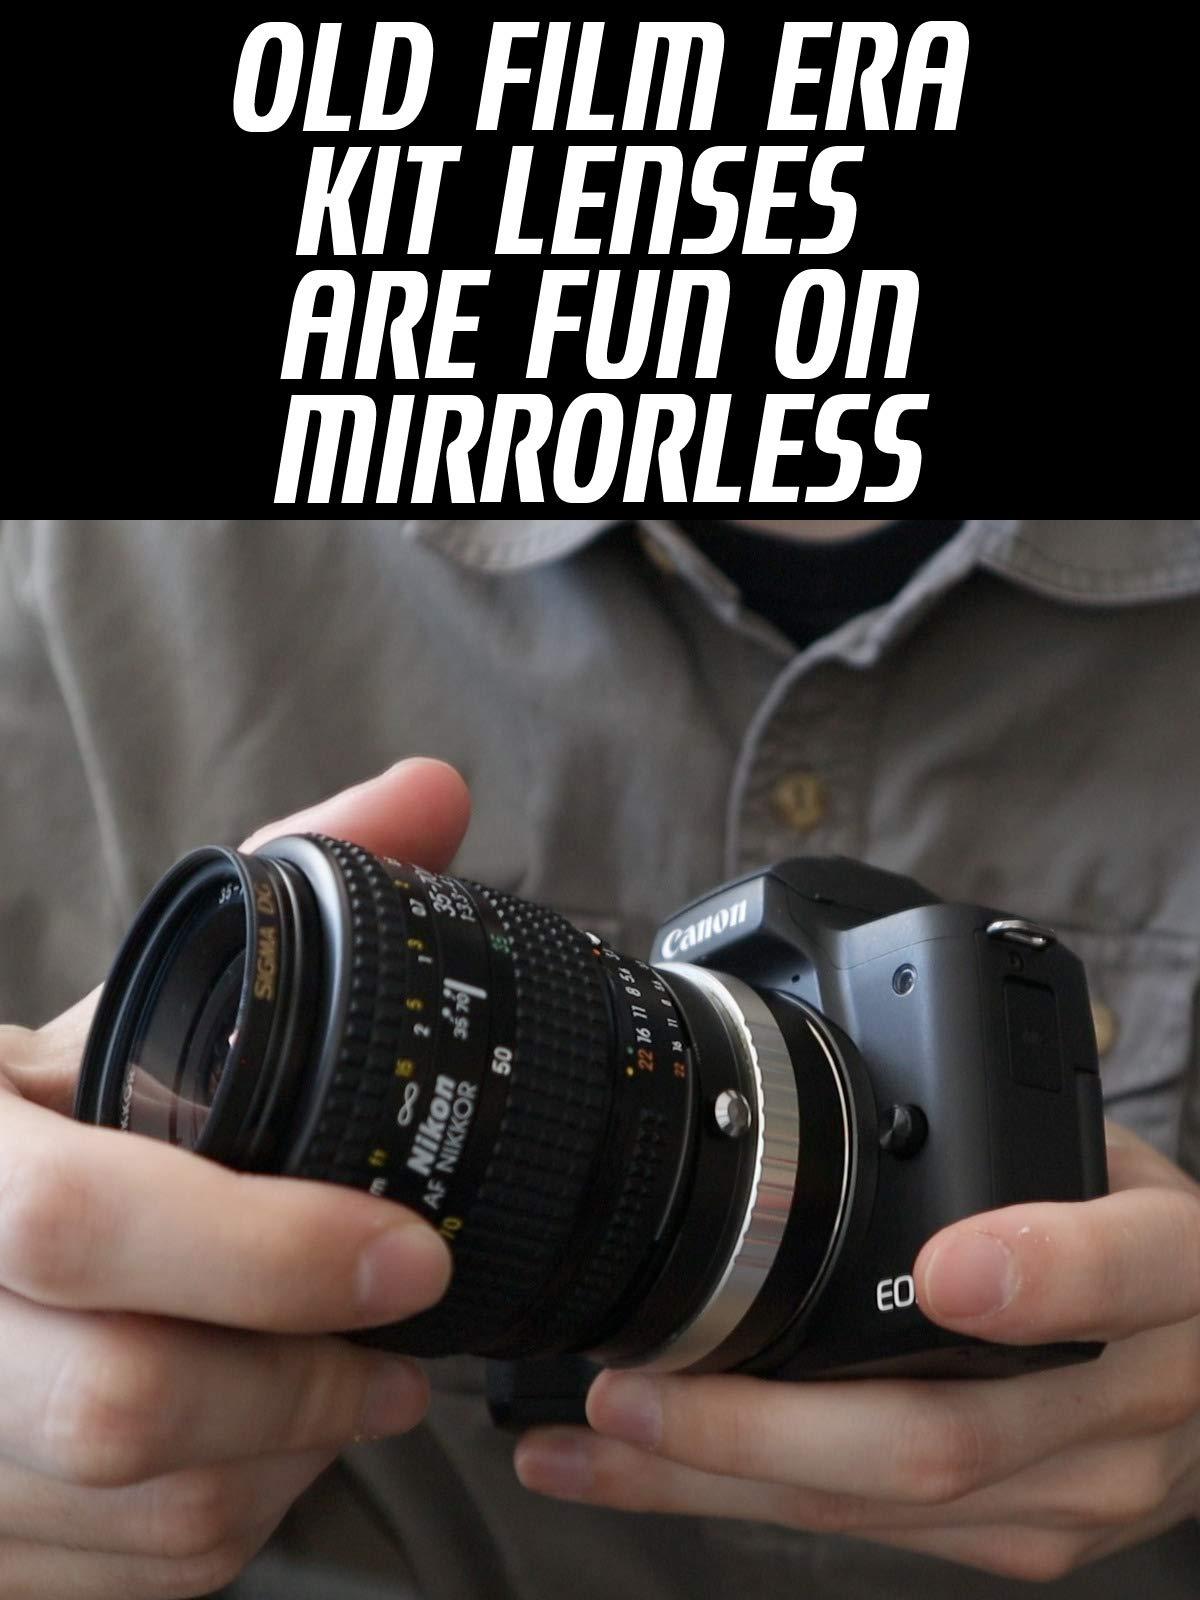 Old Film Era Kit Lenses Are Fun On Mirrorless